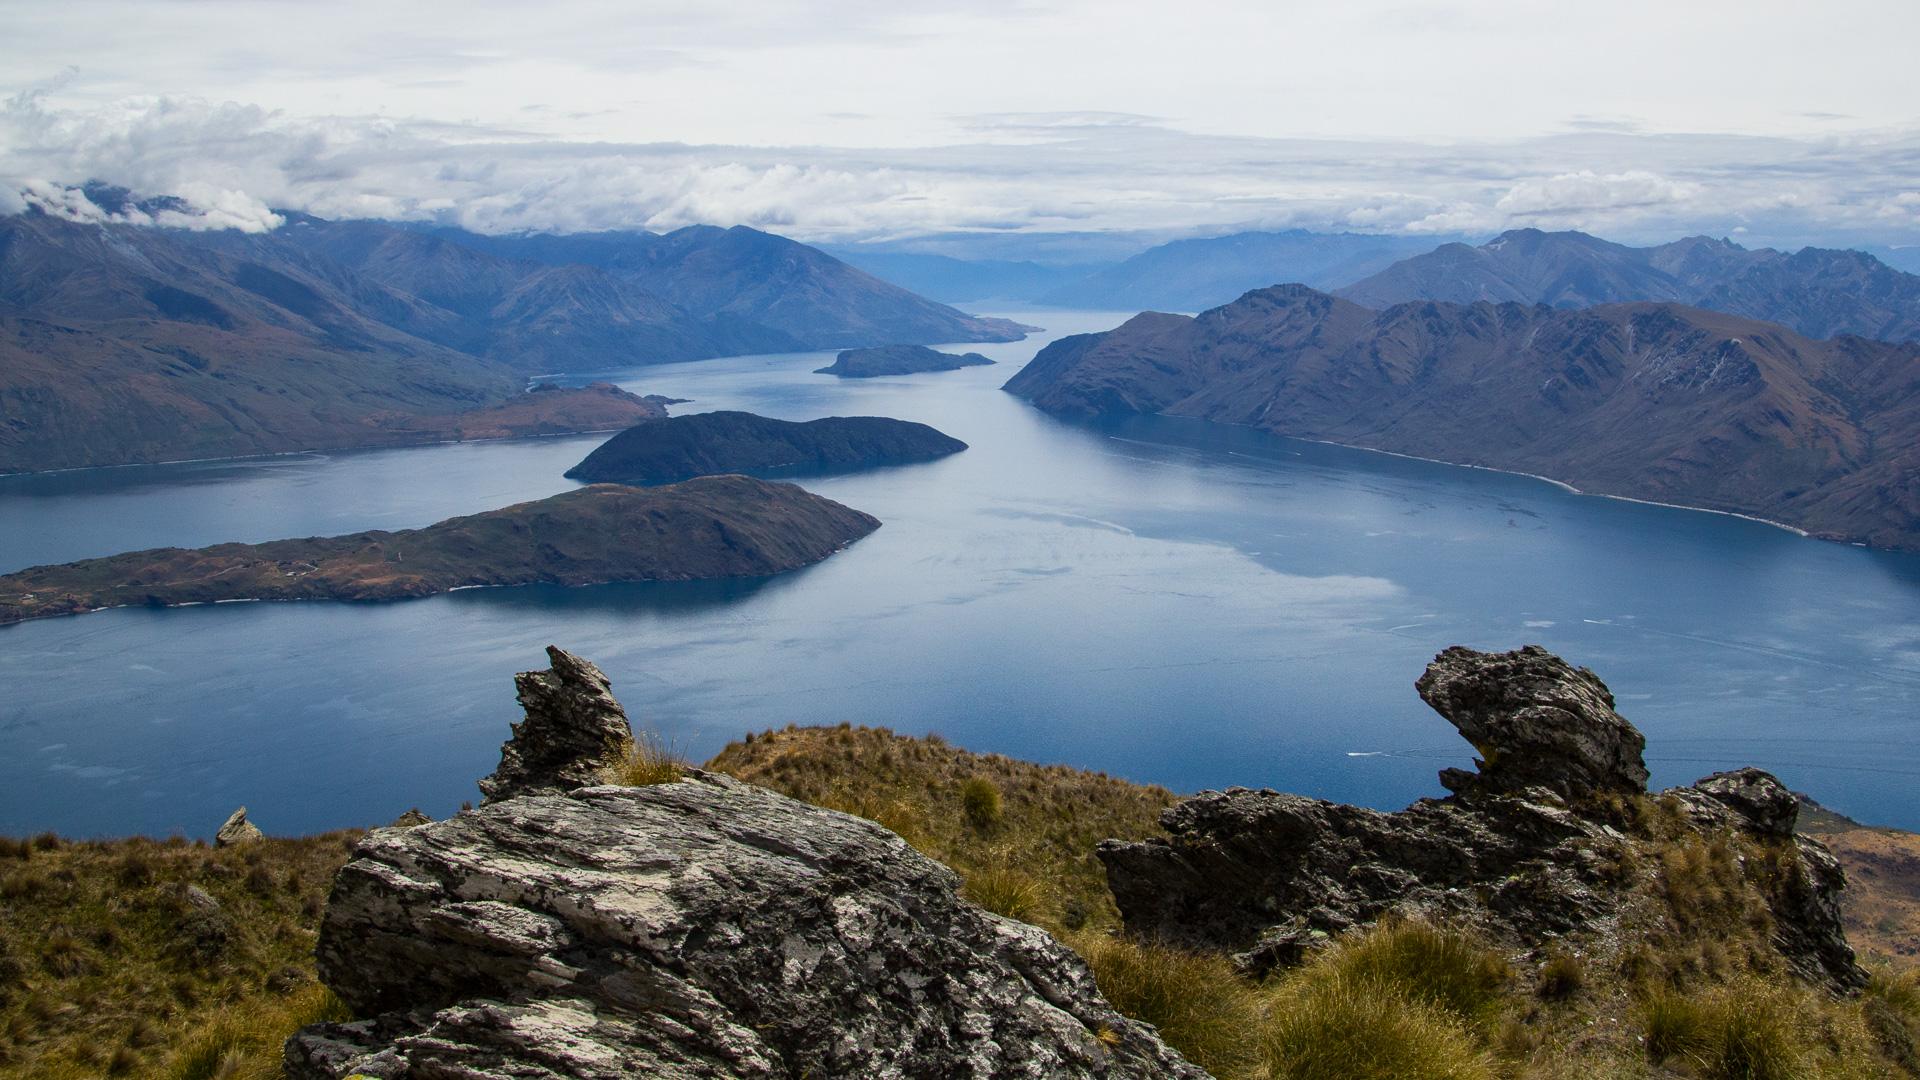 Lake-Wanaka-from-Roys-Peak